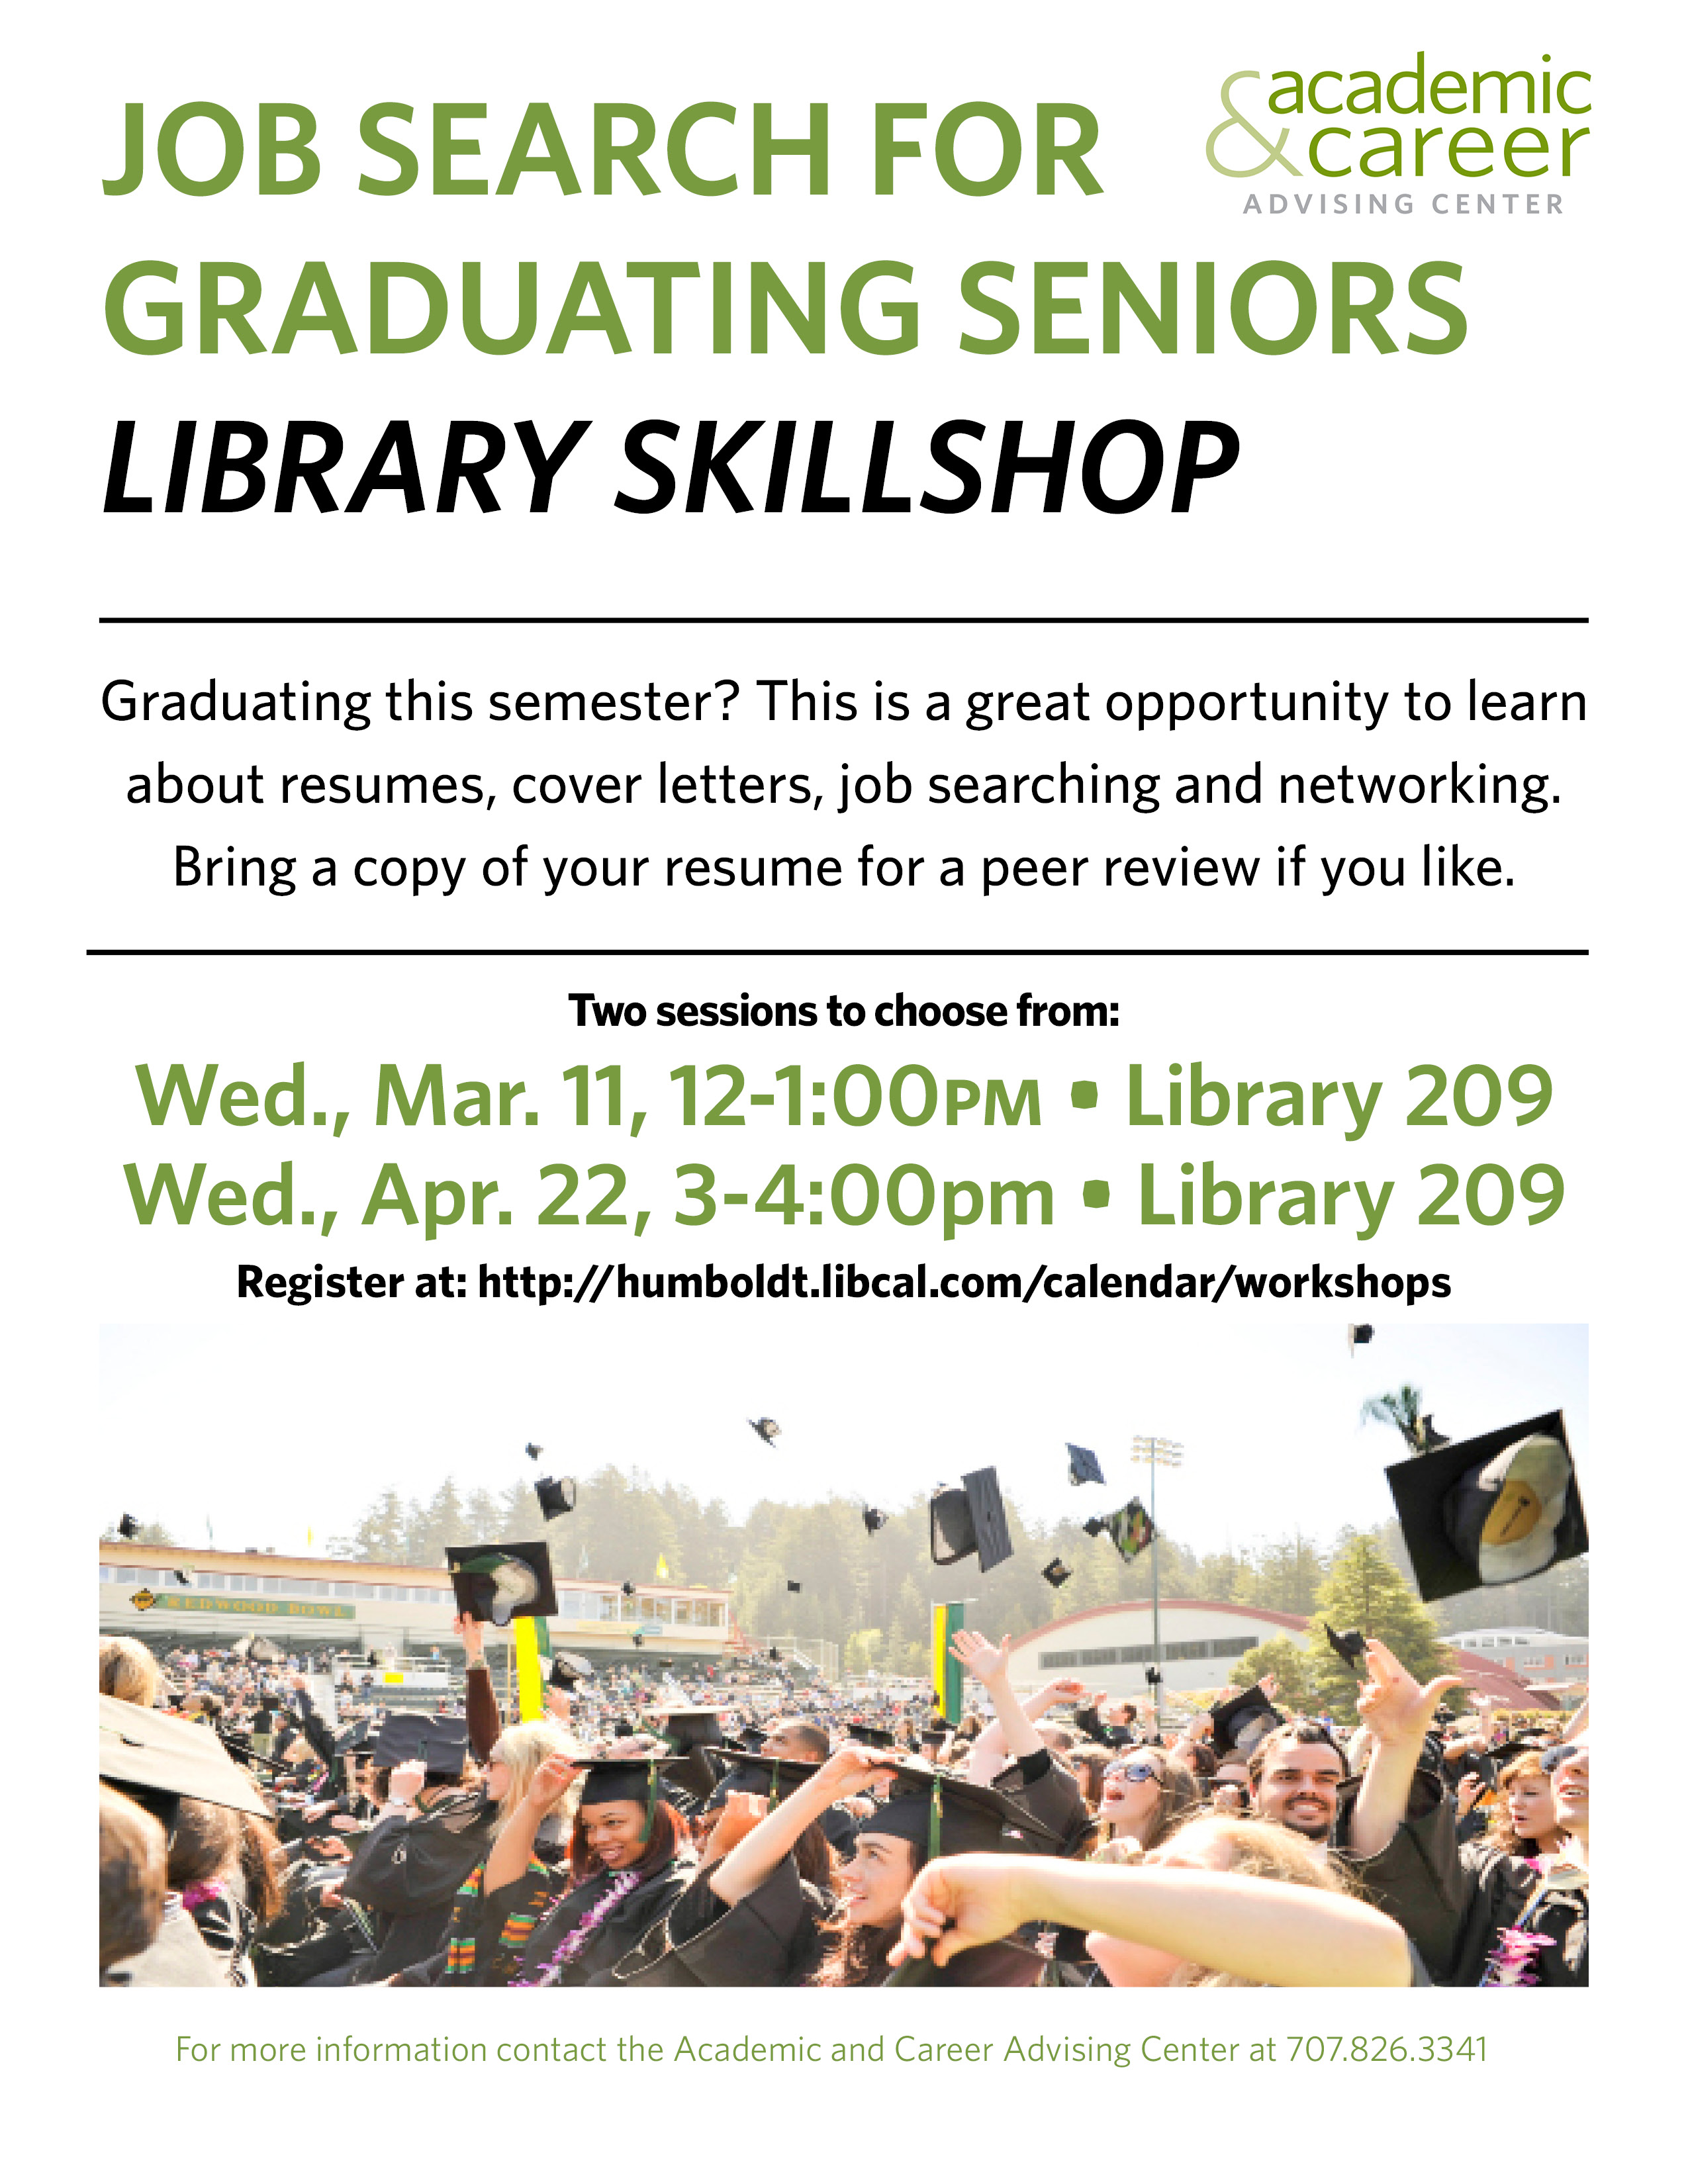 Job Search for Graduating Seniors